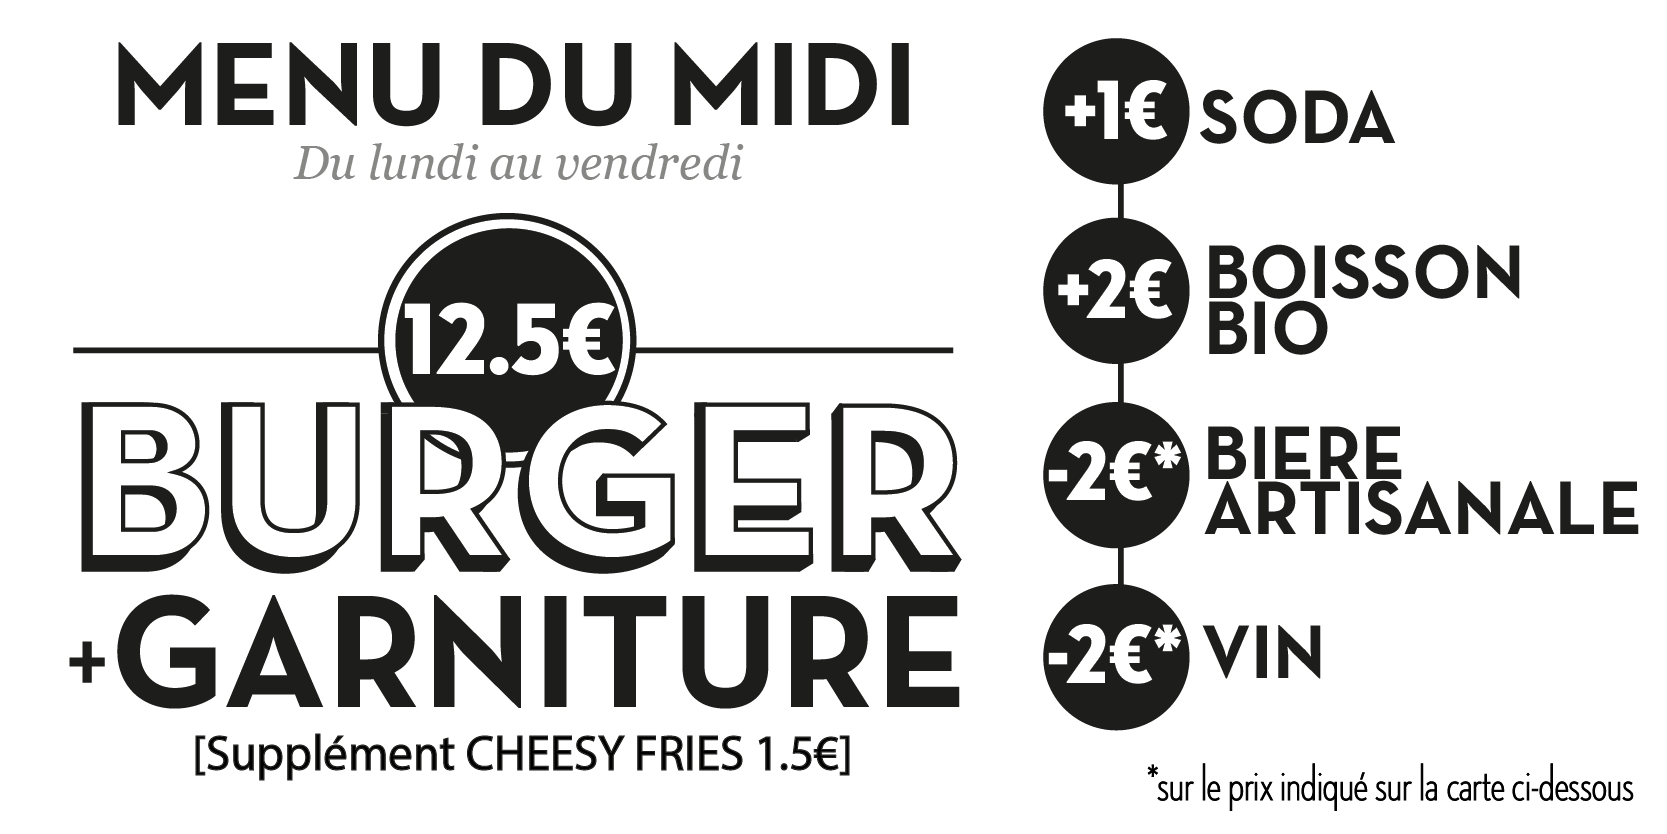 Menu du midi Edmond Pure Burger